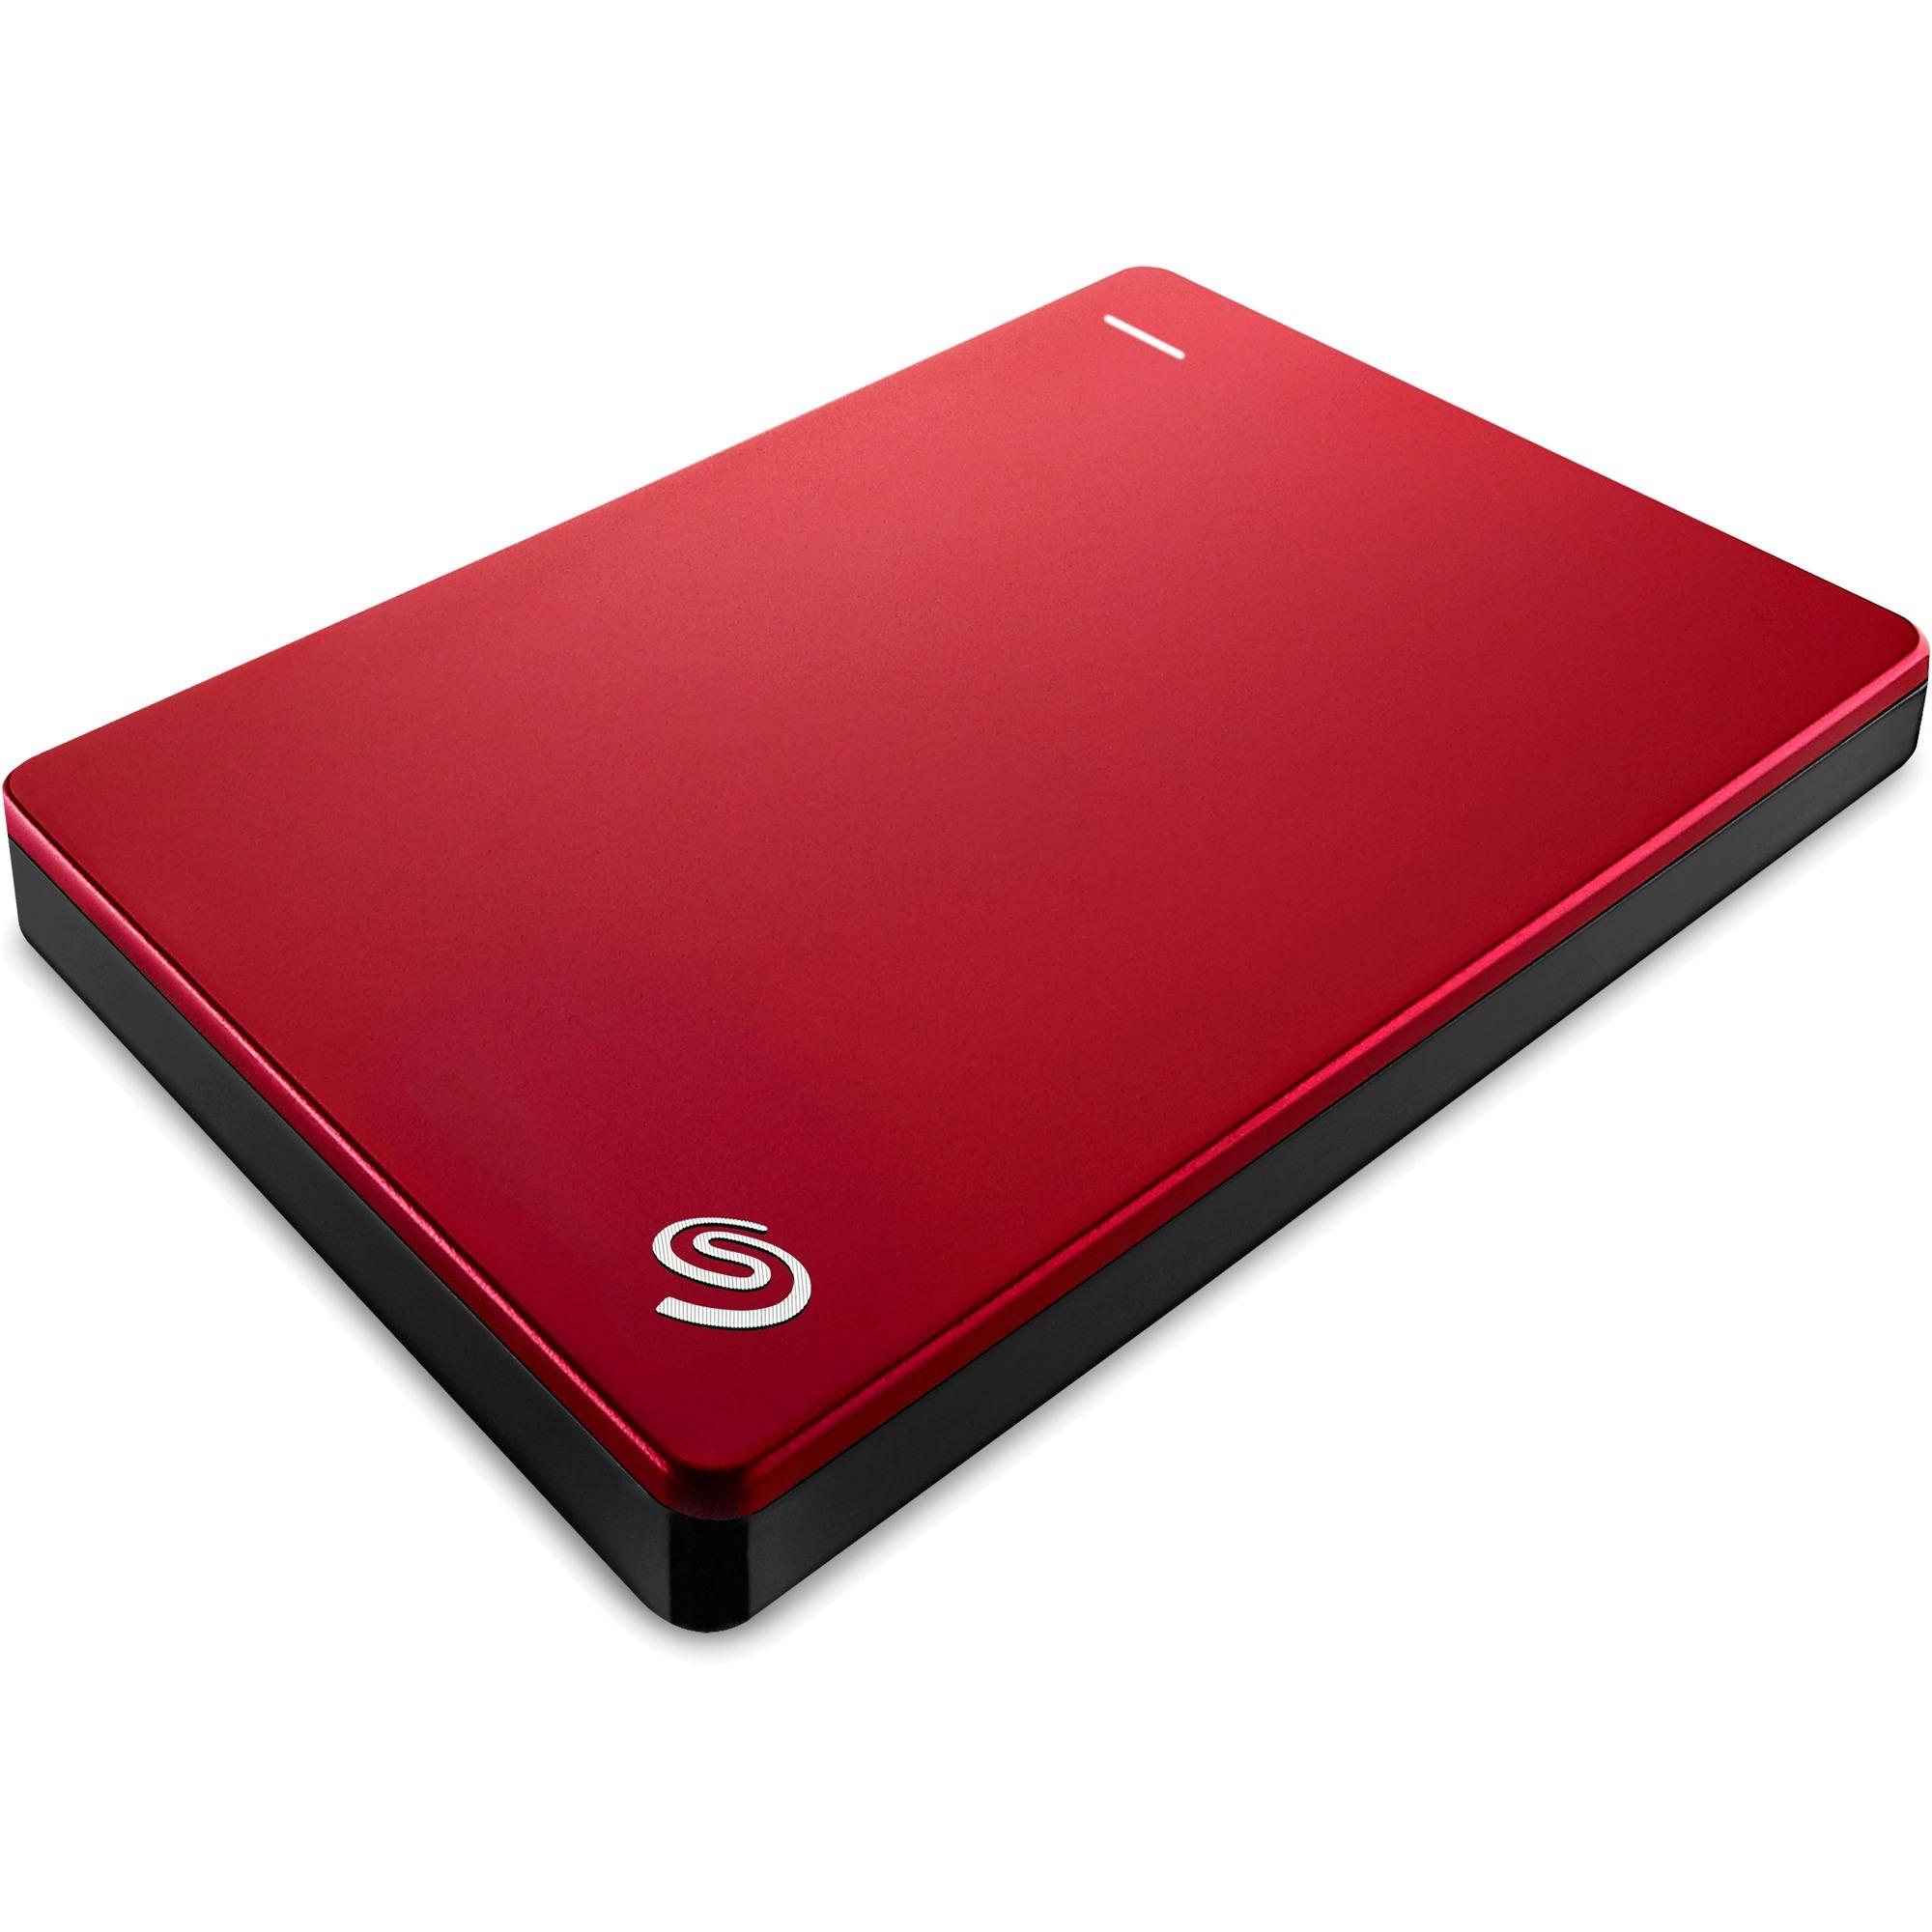 Backup Plus Slim 1TB disco duro externo 1000 GB Rojo, Unidad de disco duro